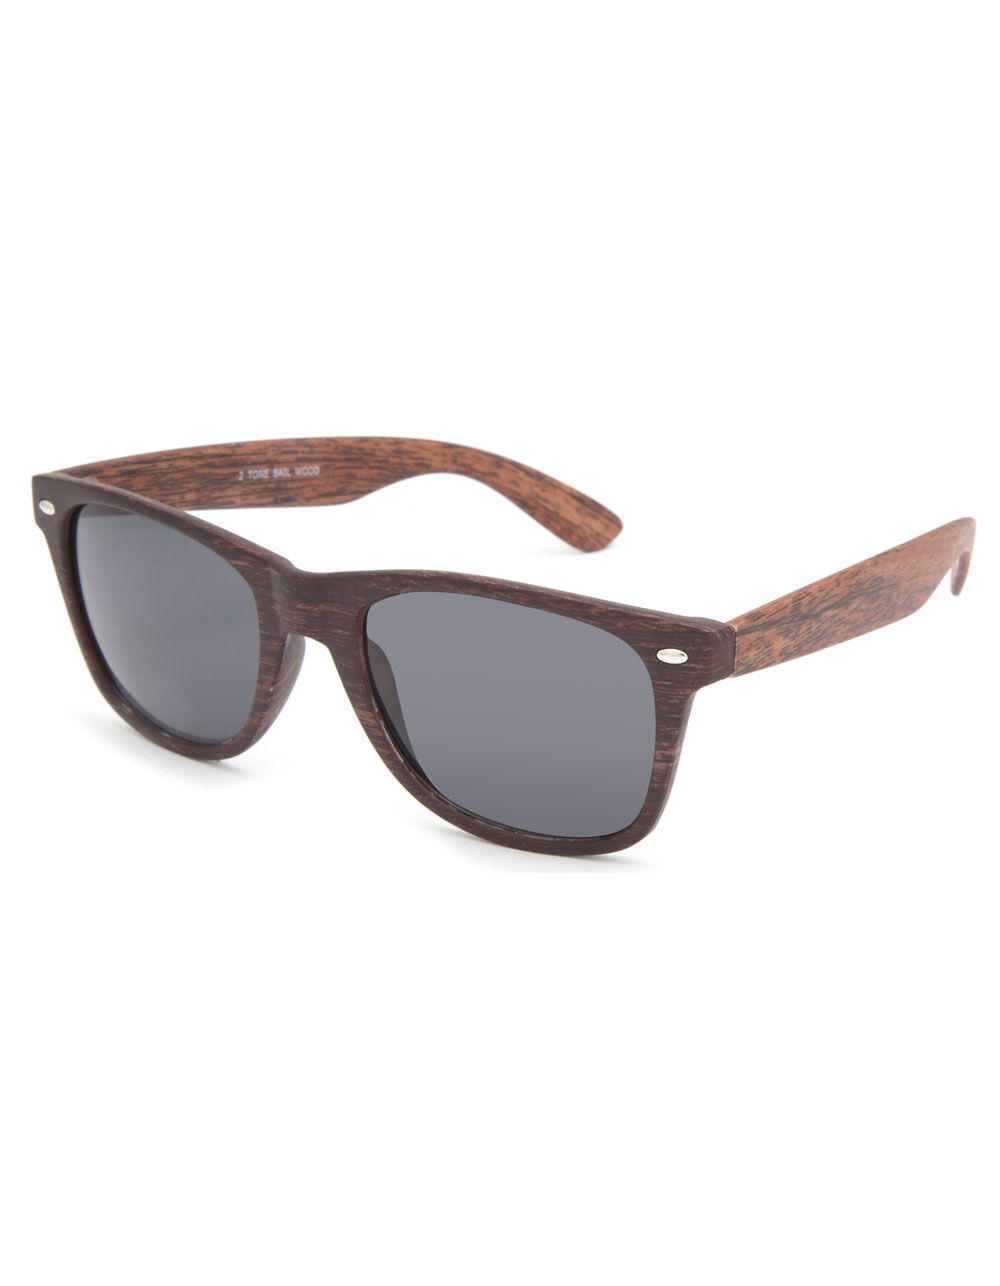 BLUE CROWN Bali Wood Sunglasses